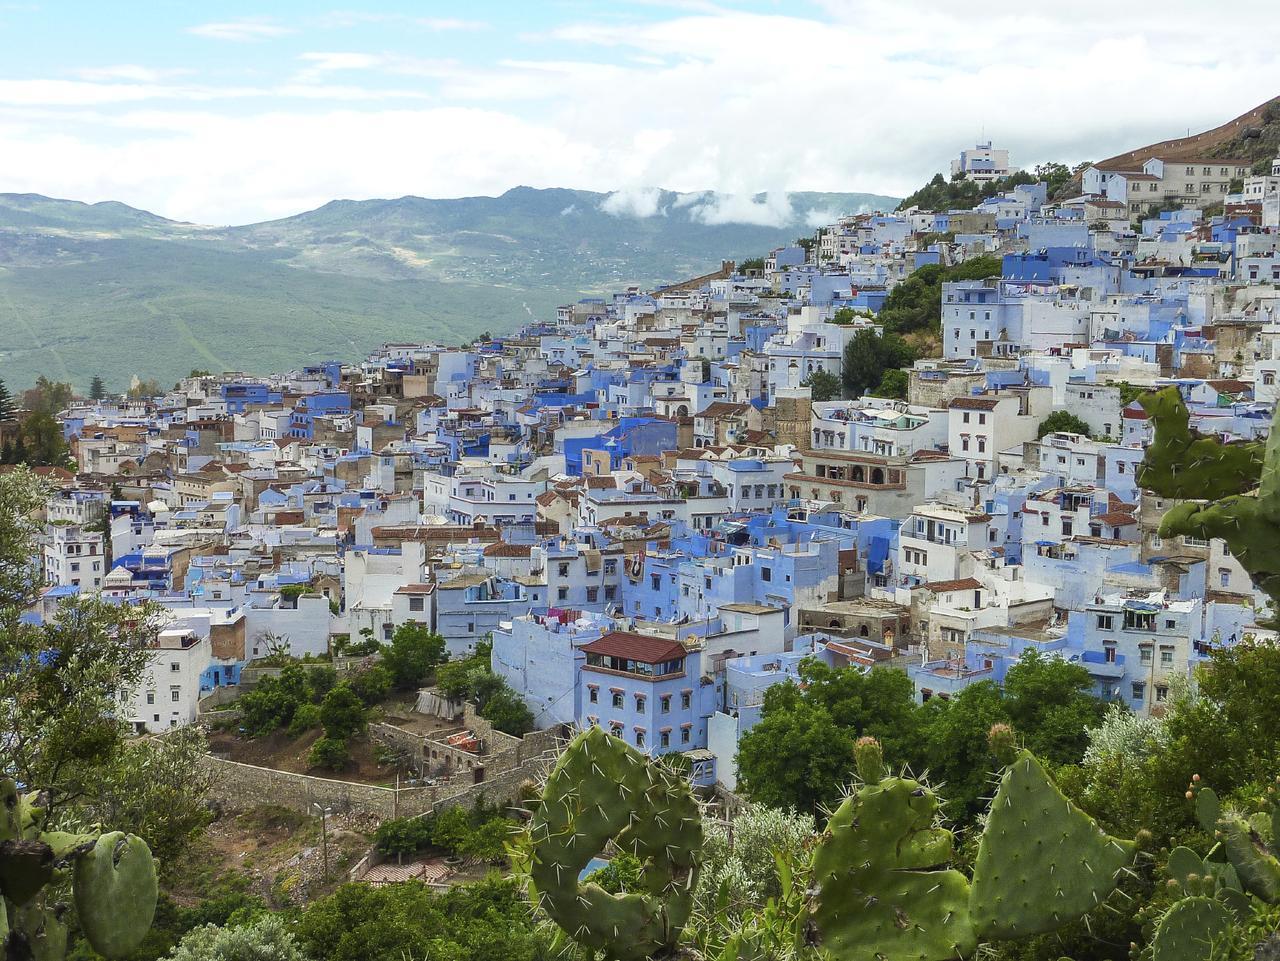 ESCAPE: CHEFCHAOUEN, MOROCCO .. Paul Ewart story .. The blue painted hill town of Chefchaouen, Morocco. Picture: iStock